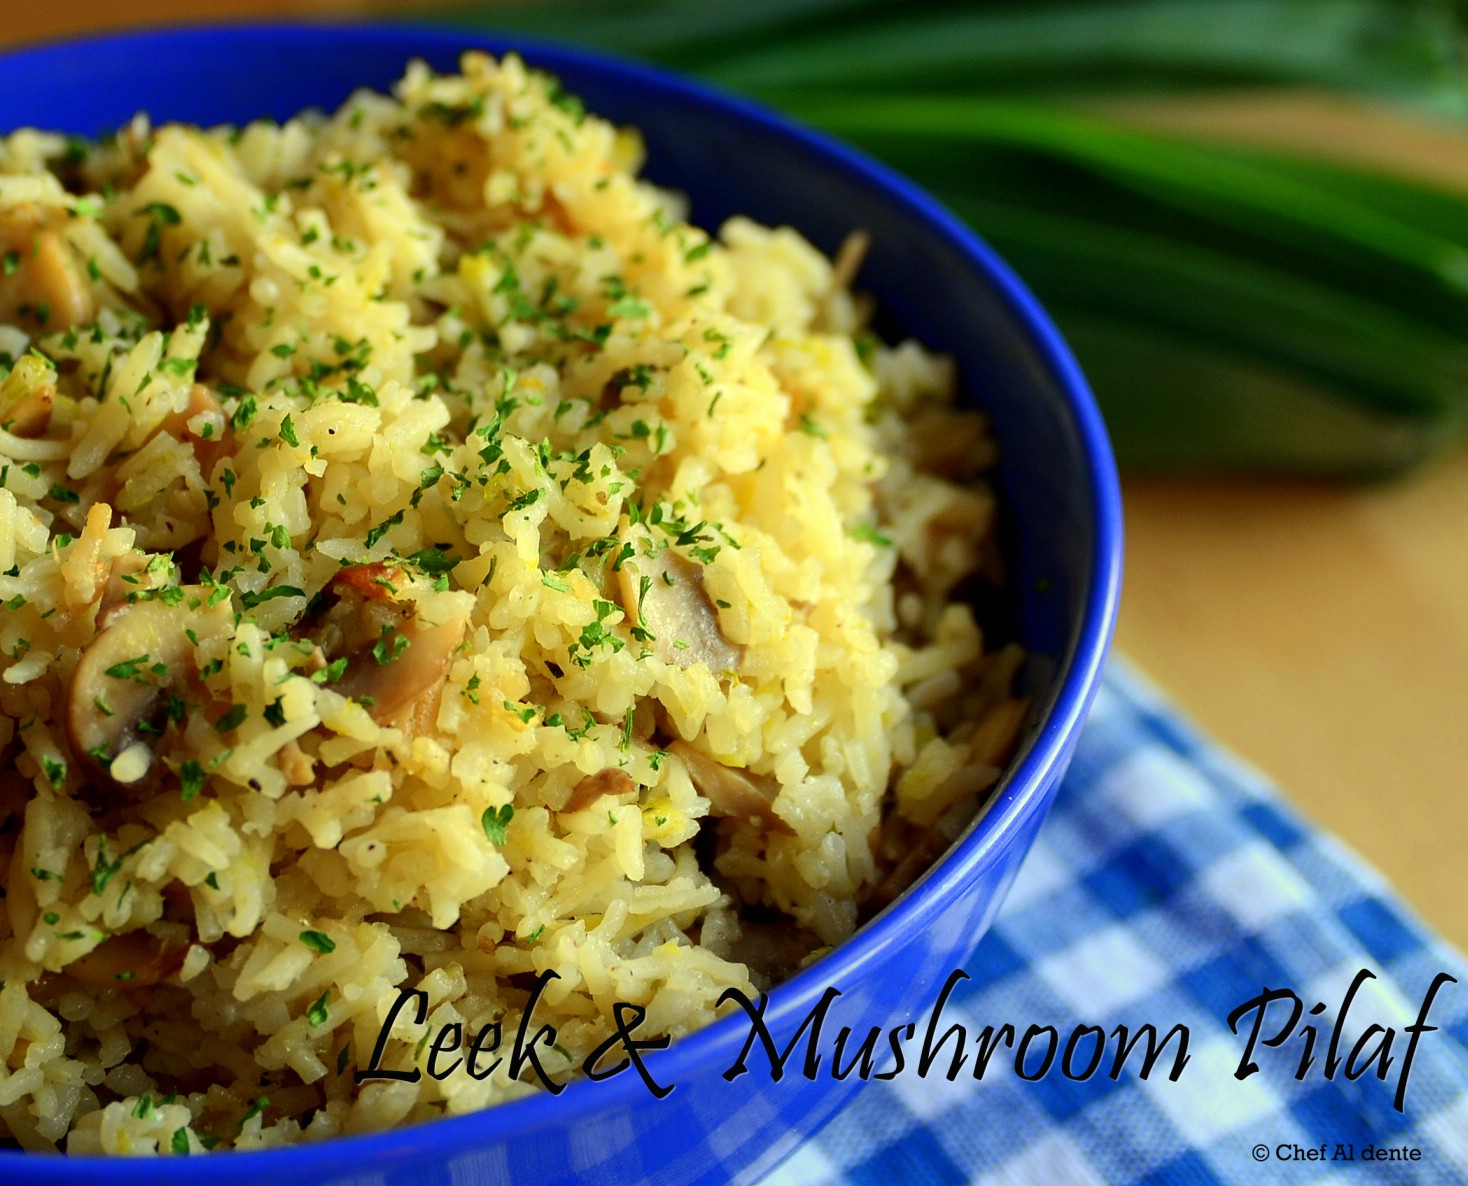 Indian food recipes indian recipes desi food desi recipes leek mushroom pilaf forumfinder Choice Image